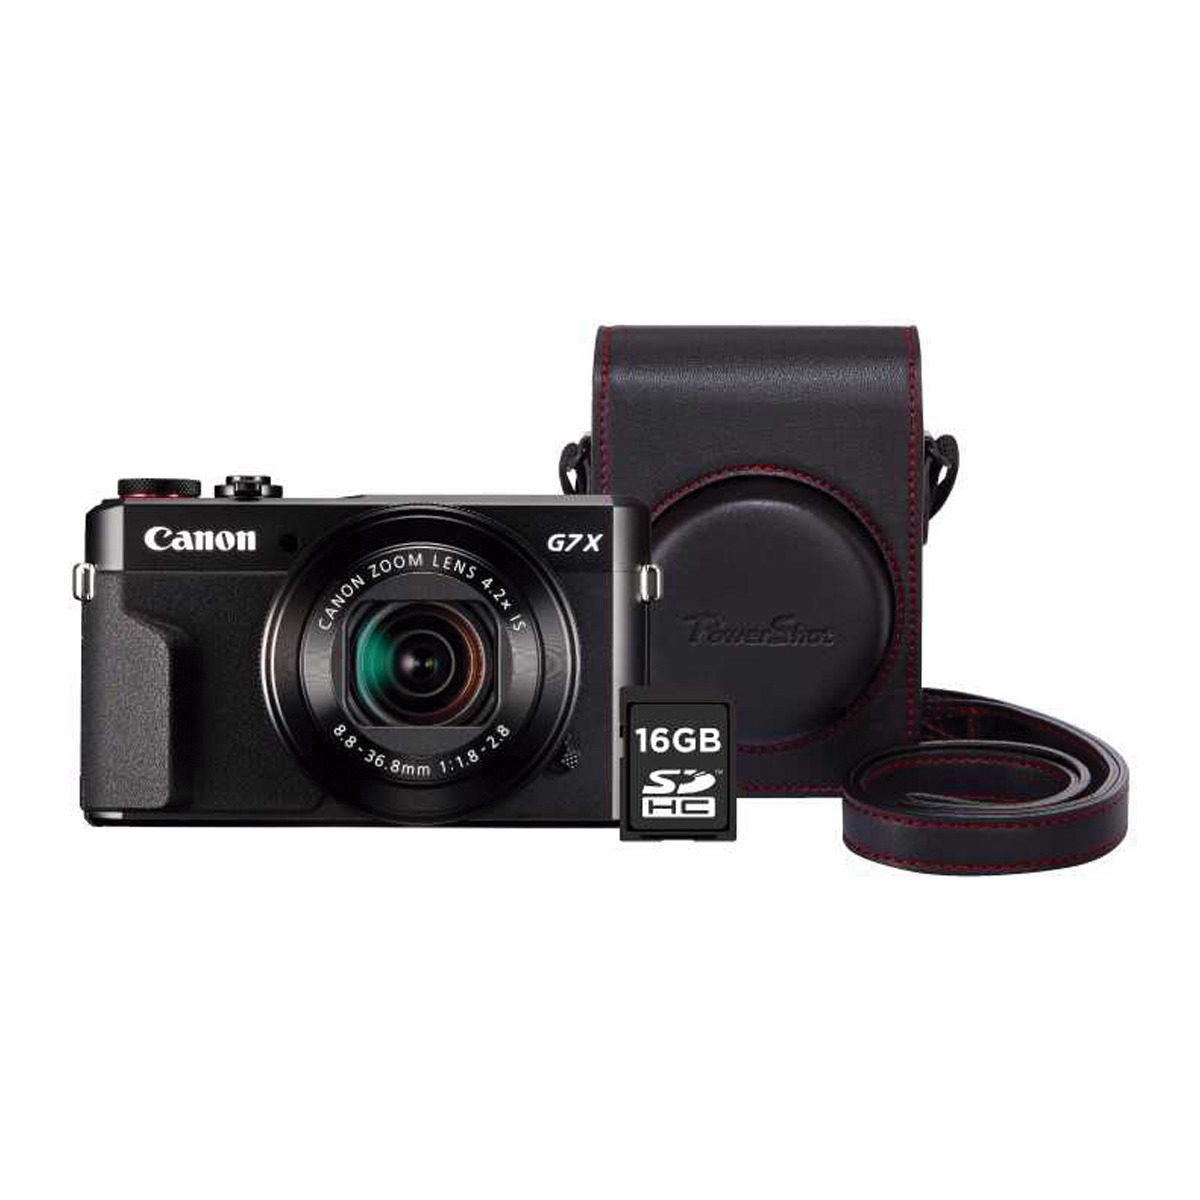 Cámara compacta Canon PowerShot G7 X